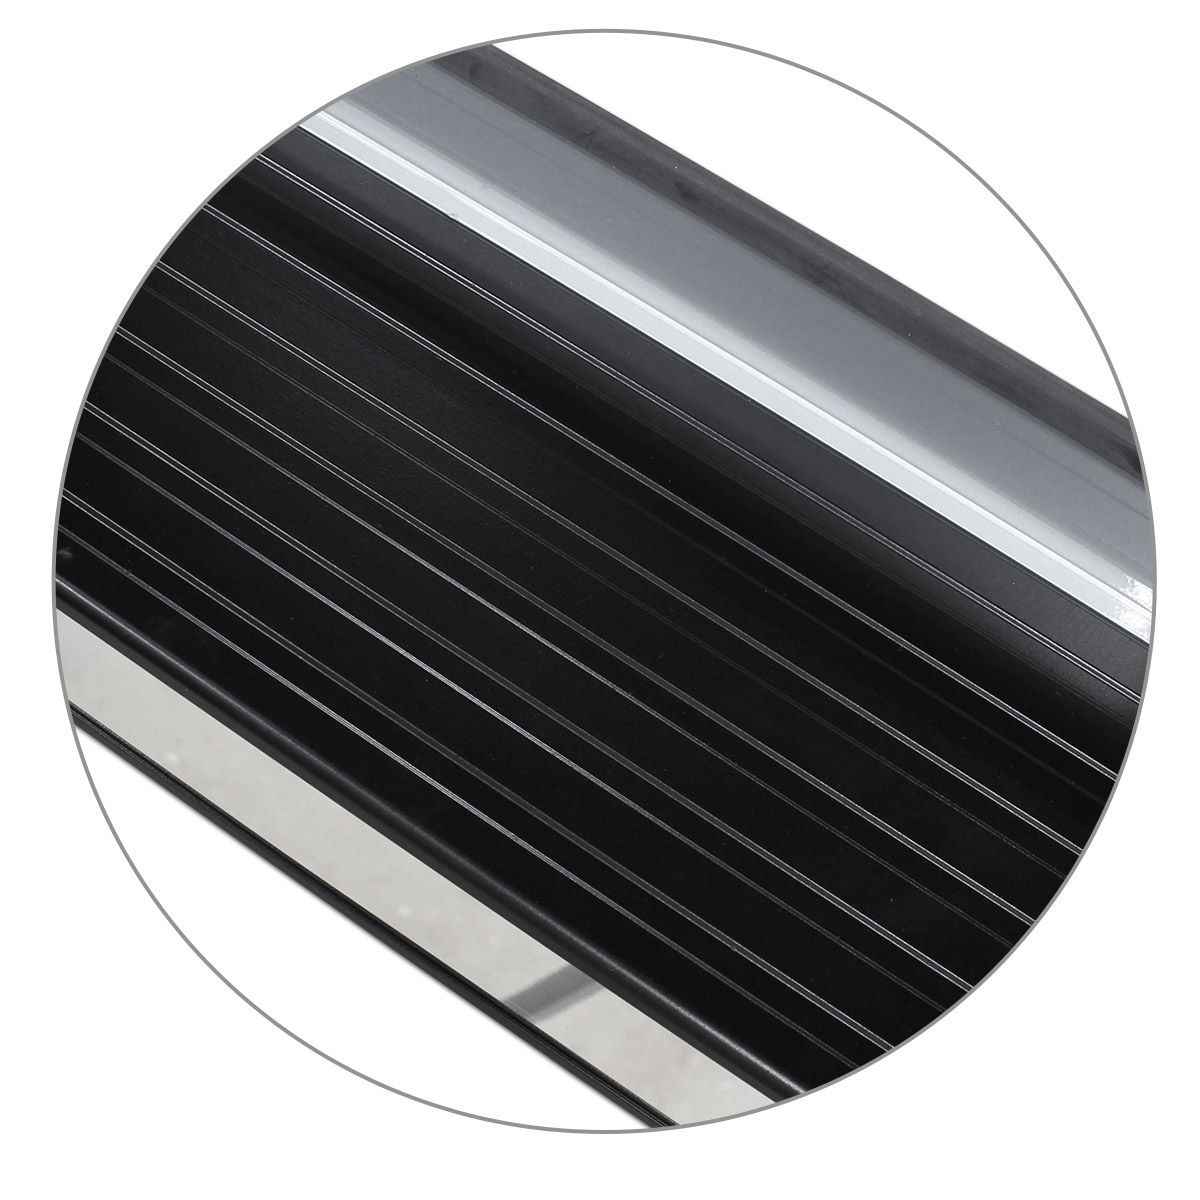 Estribo Lateral S10 CD 2012 a 2020 Prata Switchblade Personalizado